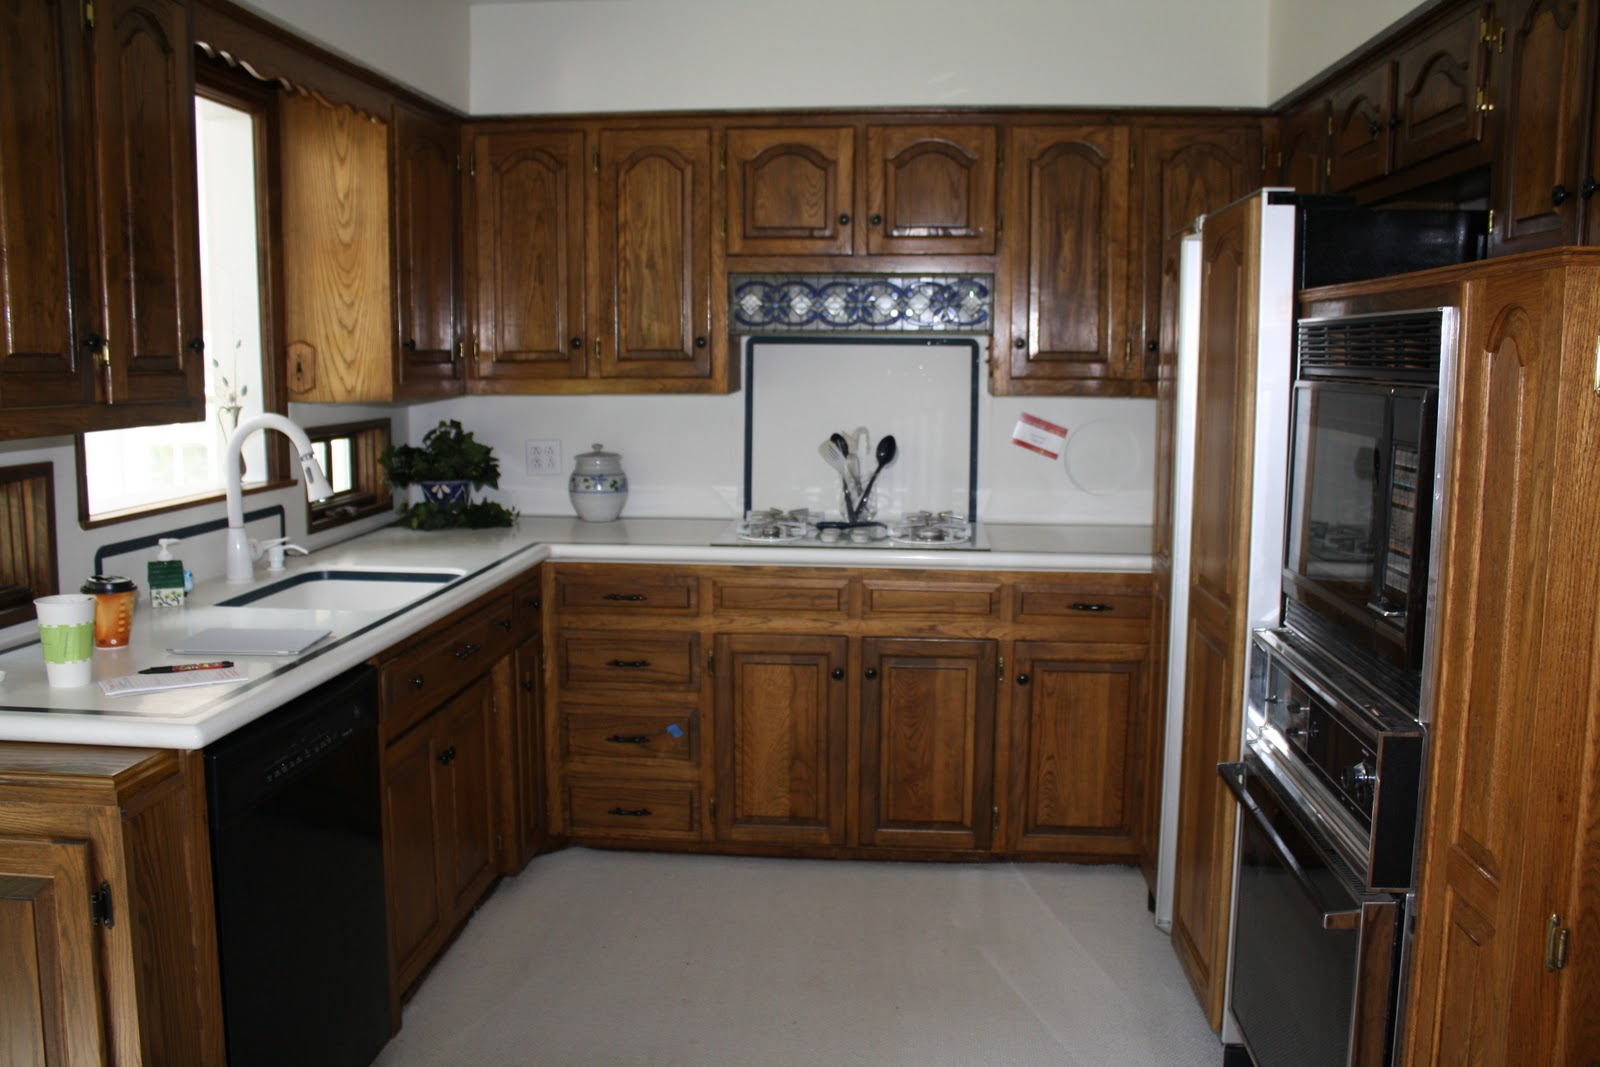 Refinishing Kitchen Cabinets White